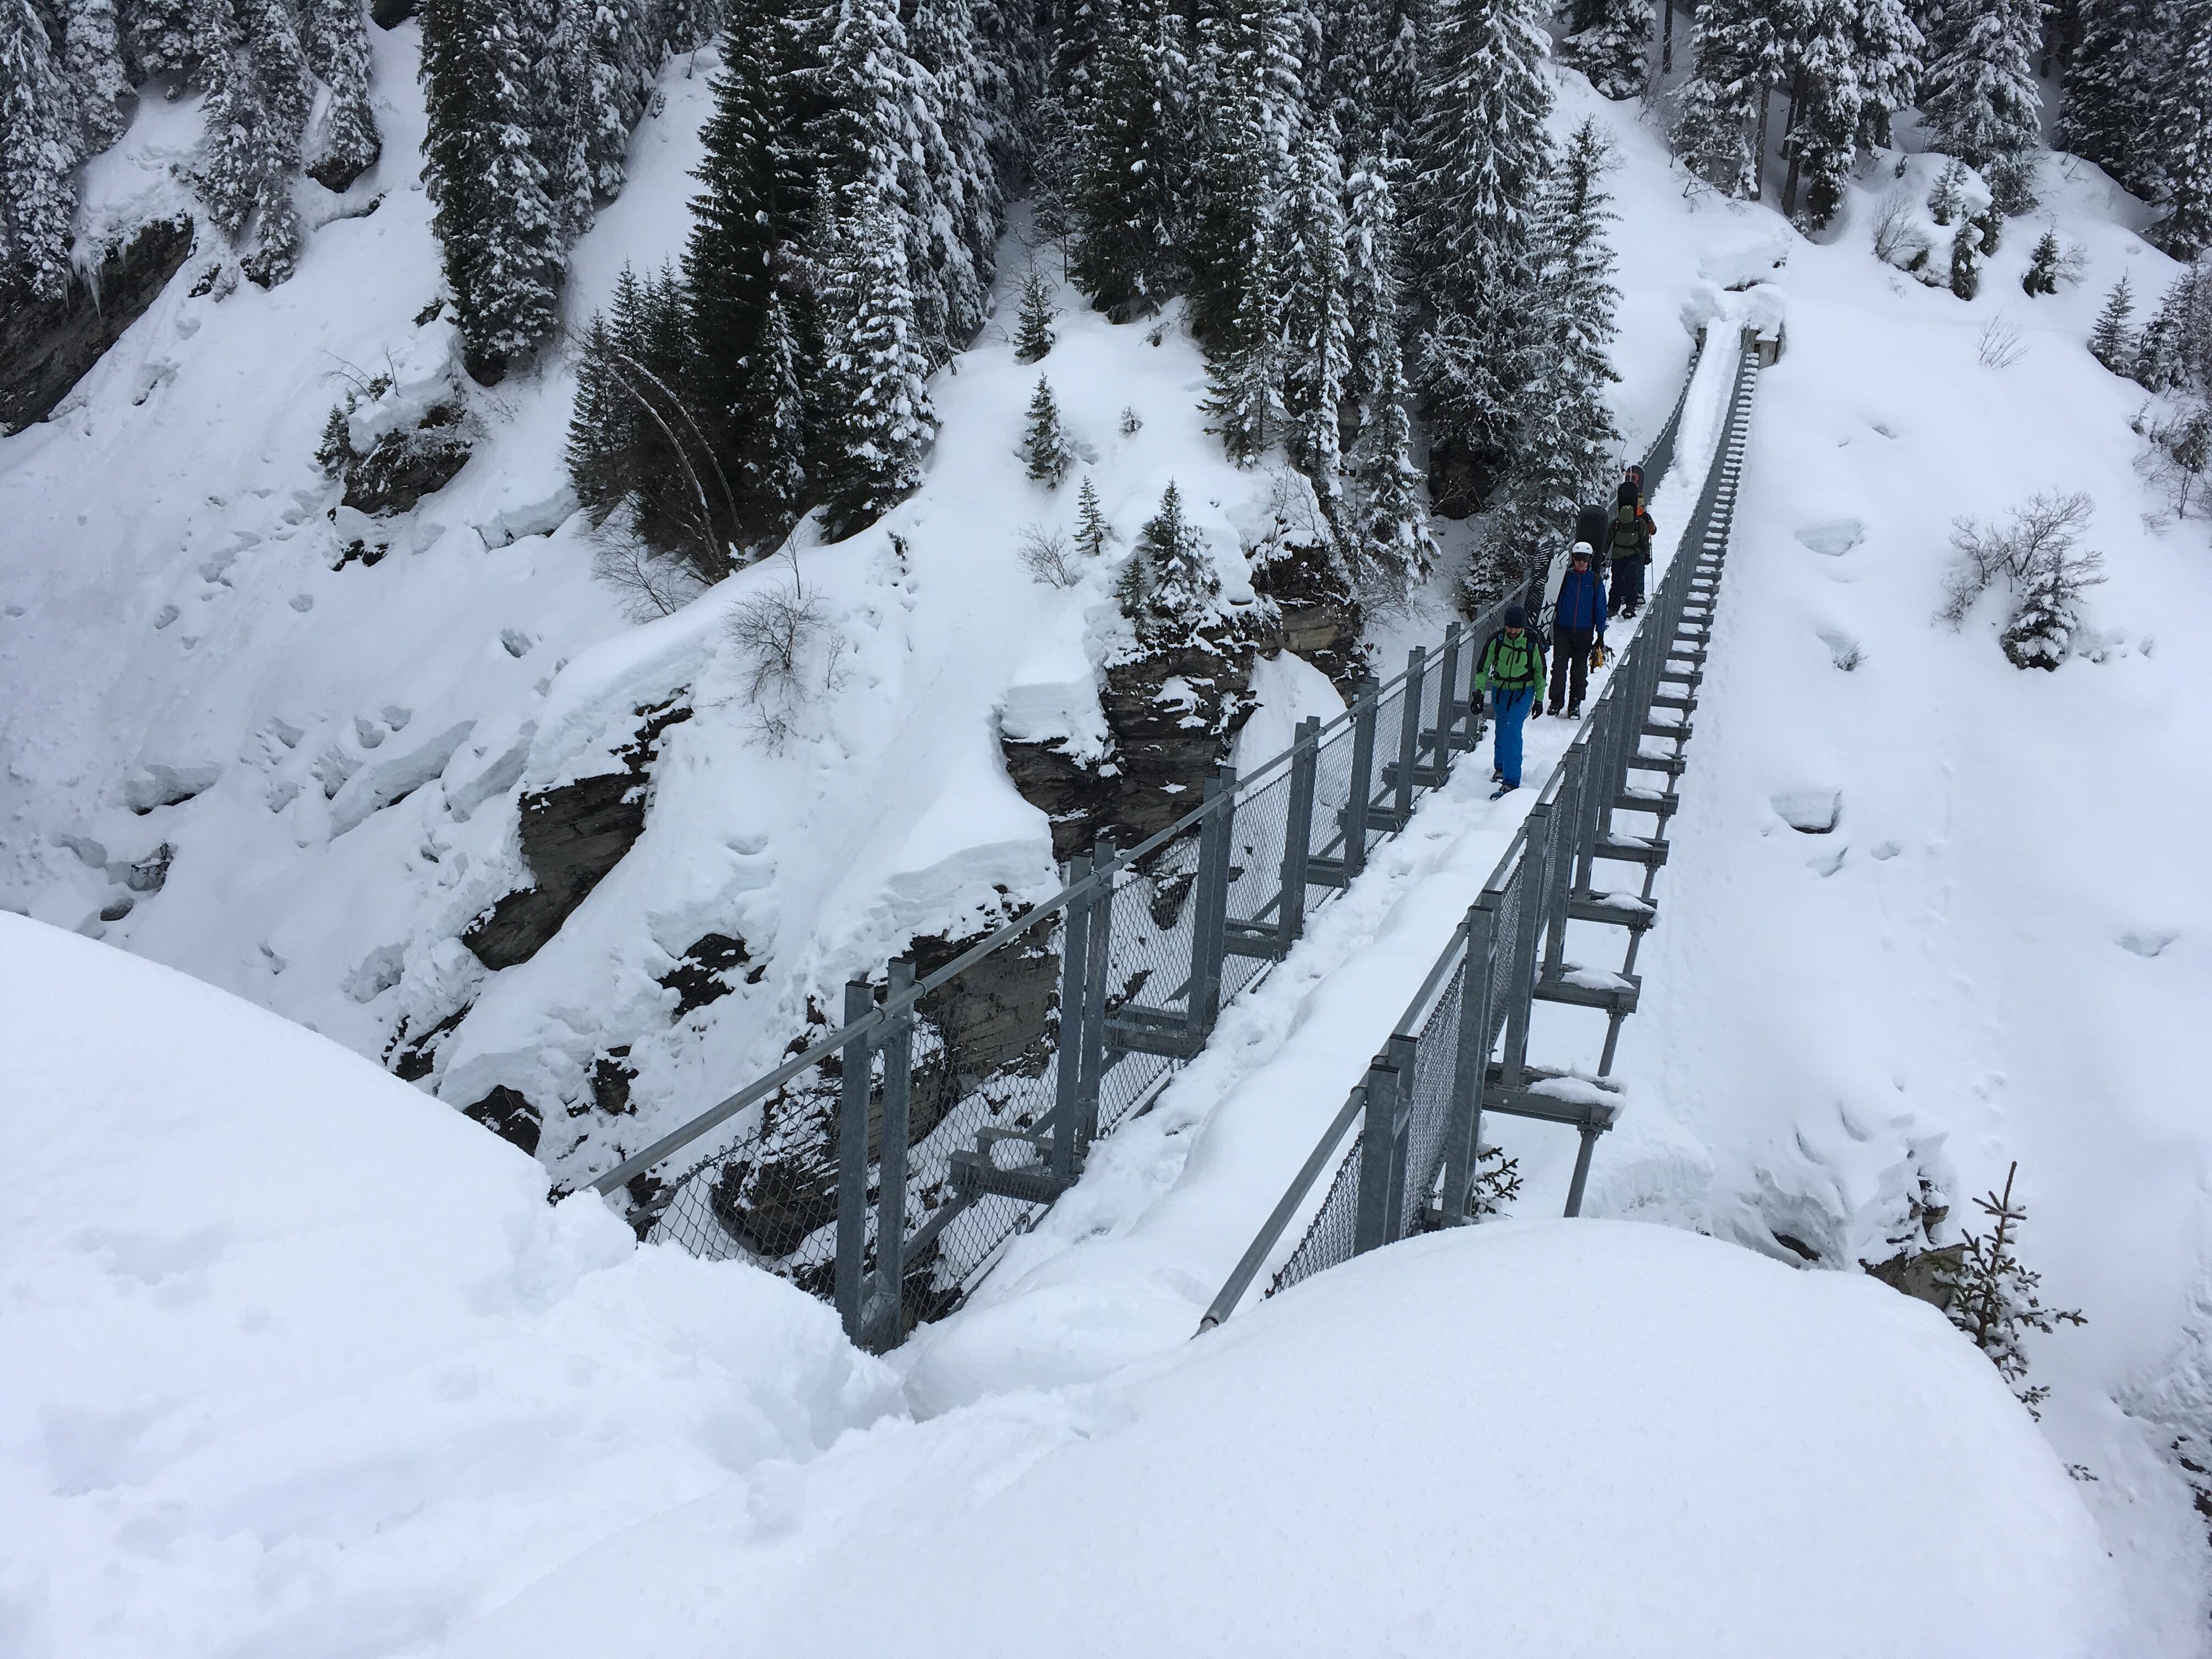 Col de la Louze snowboard 11